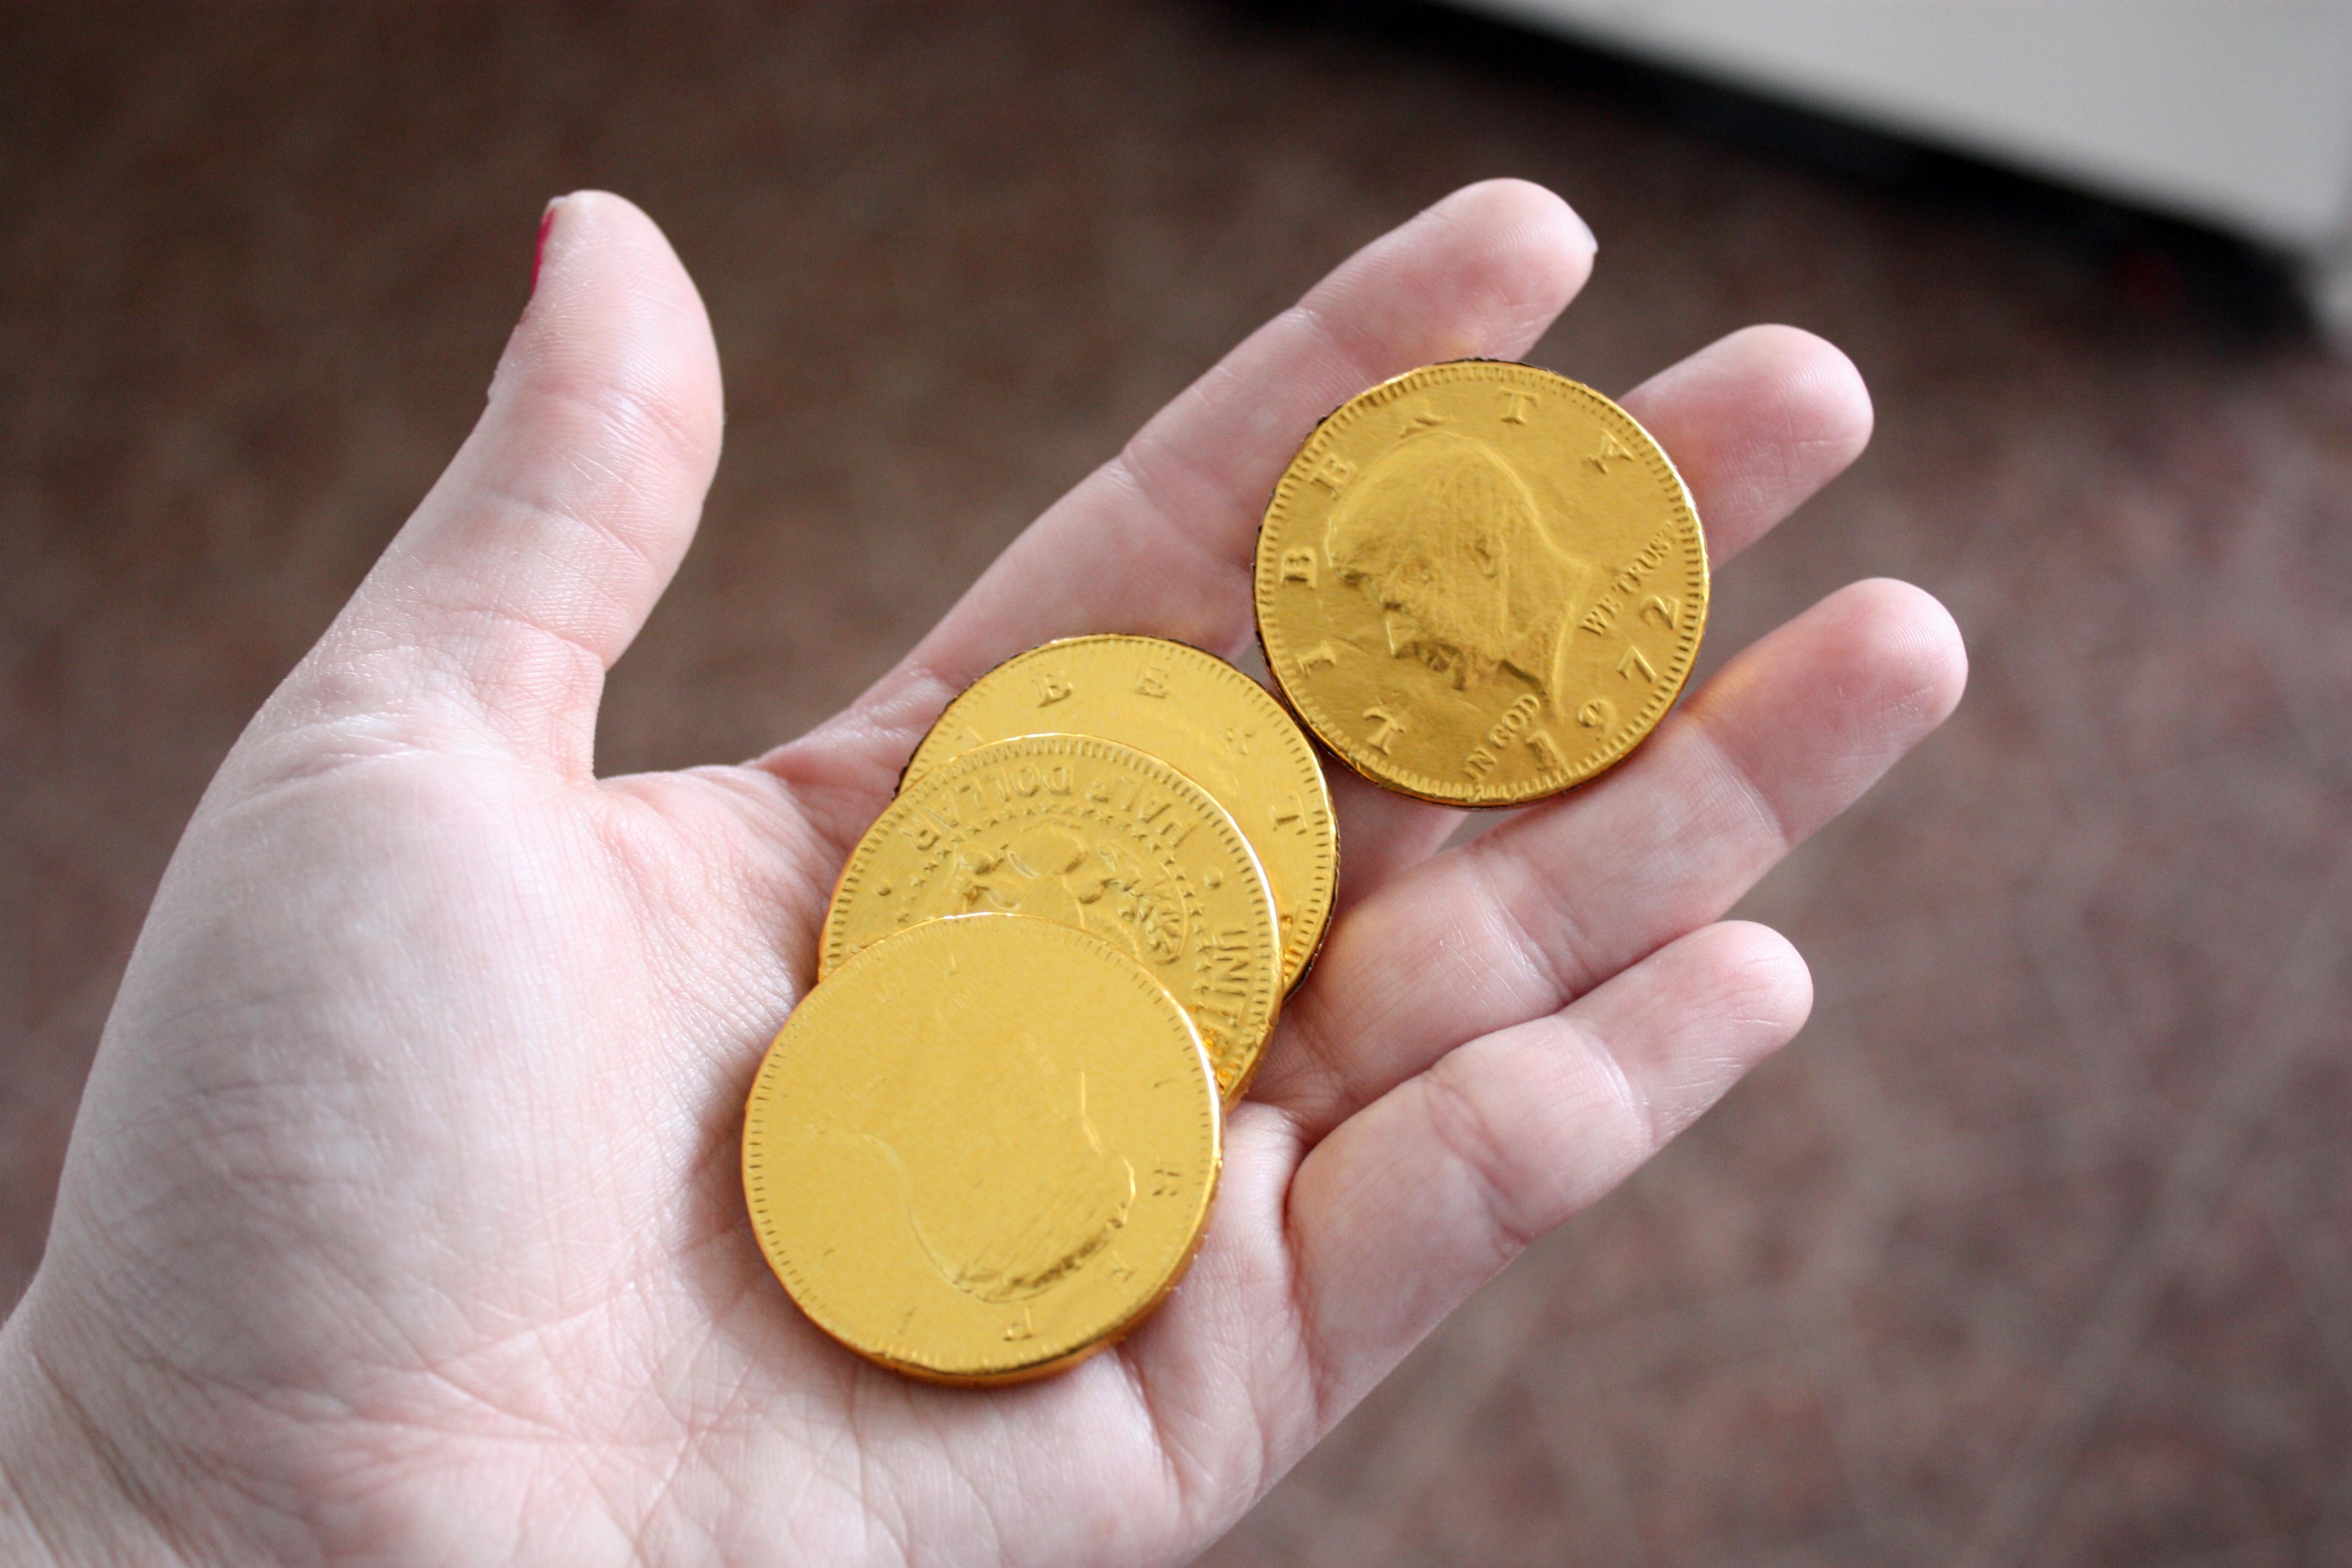 File:Chocolate coins.jpg - Wikimedia Commons